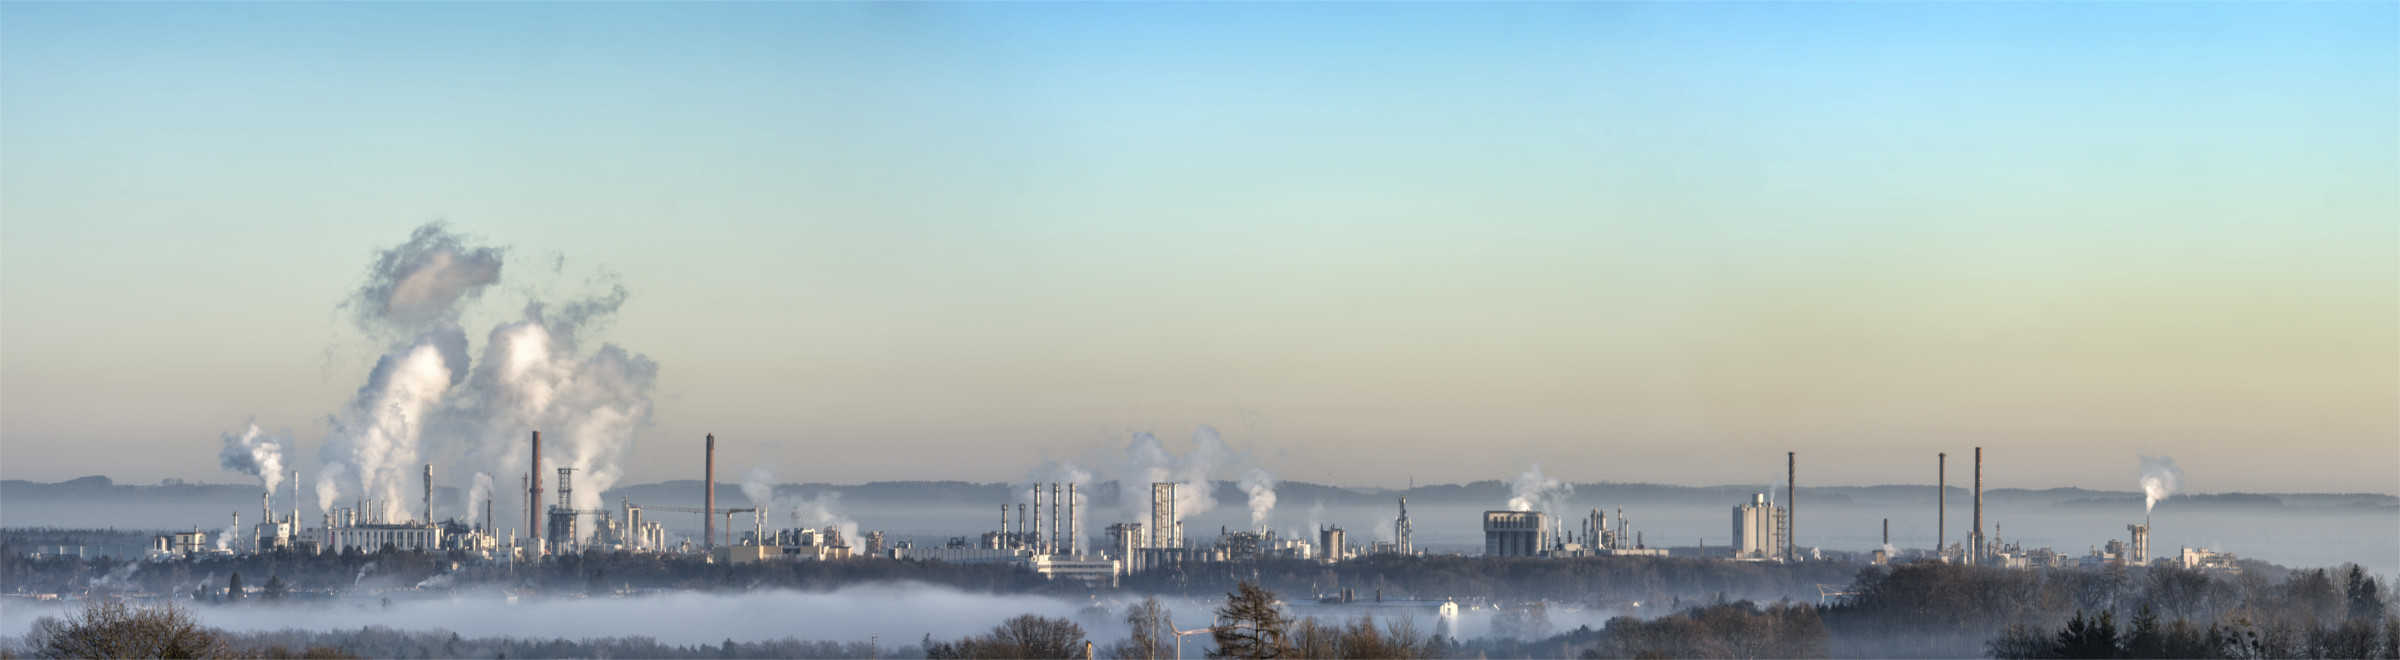 Raffinerie OMV